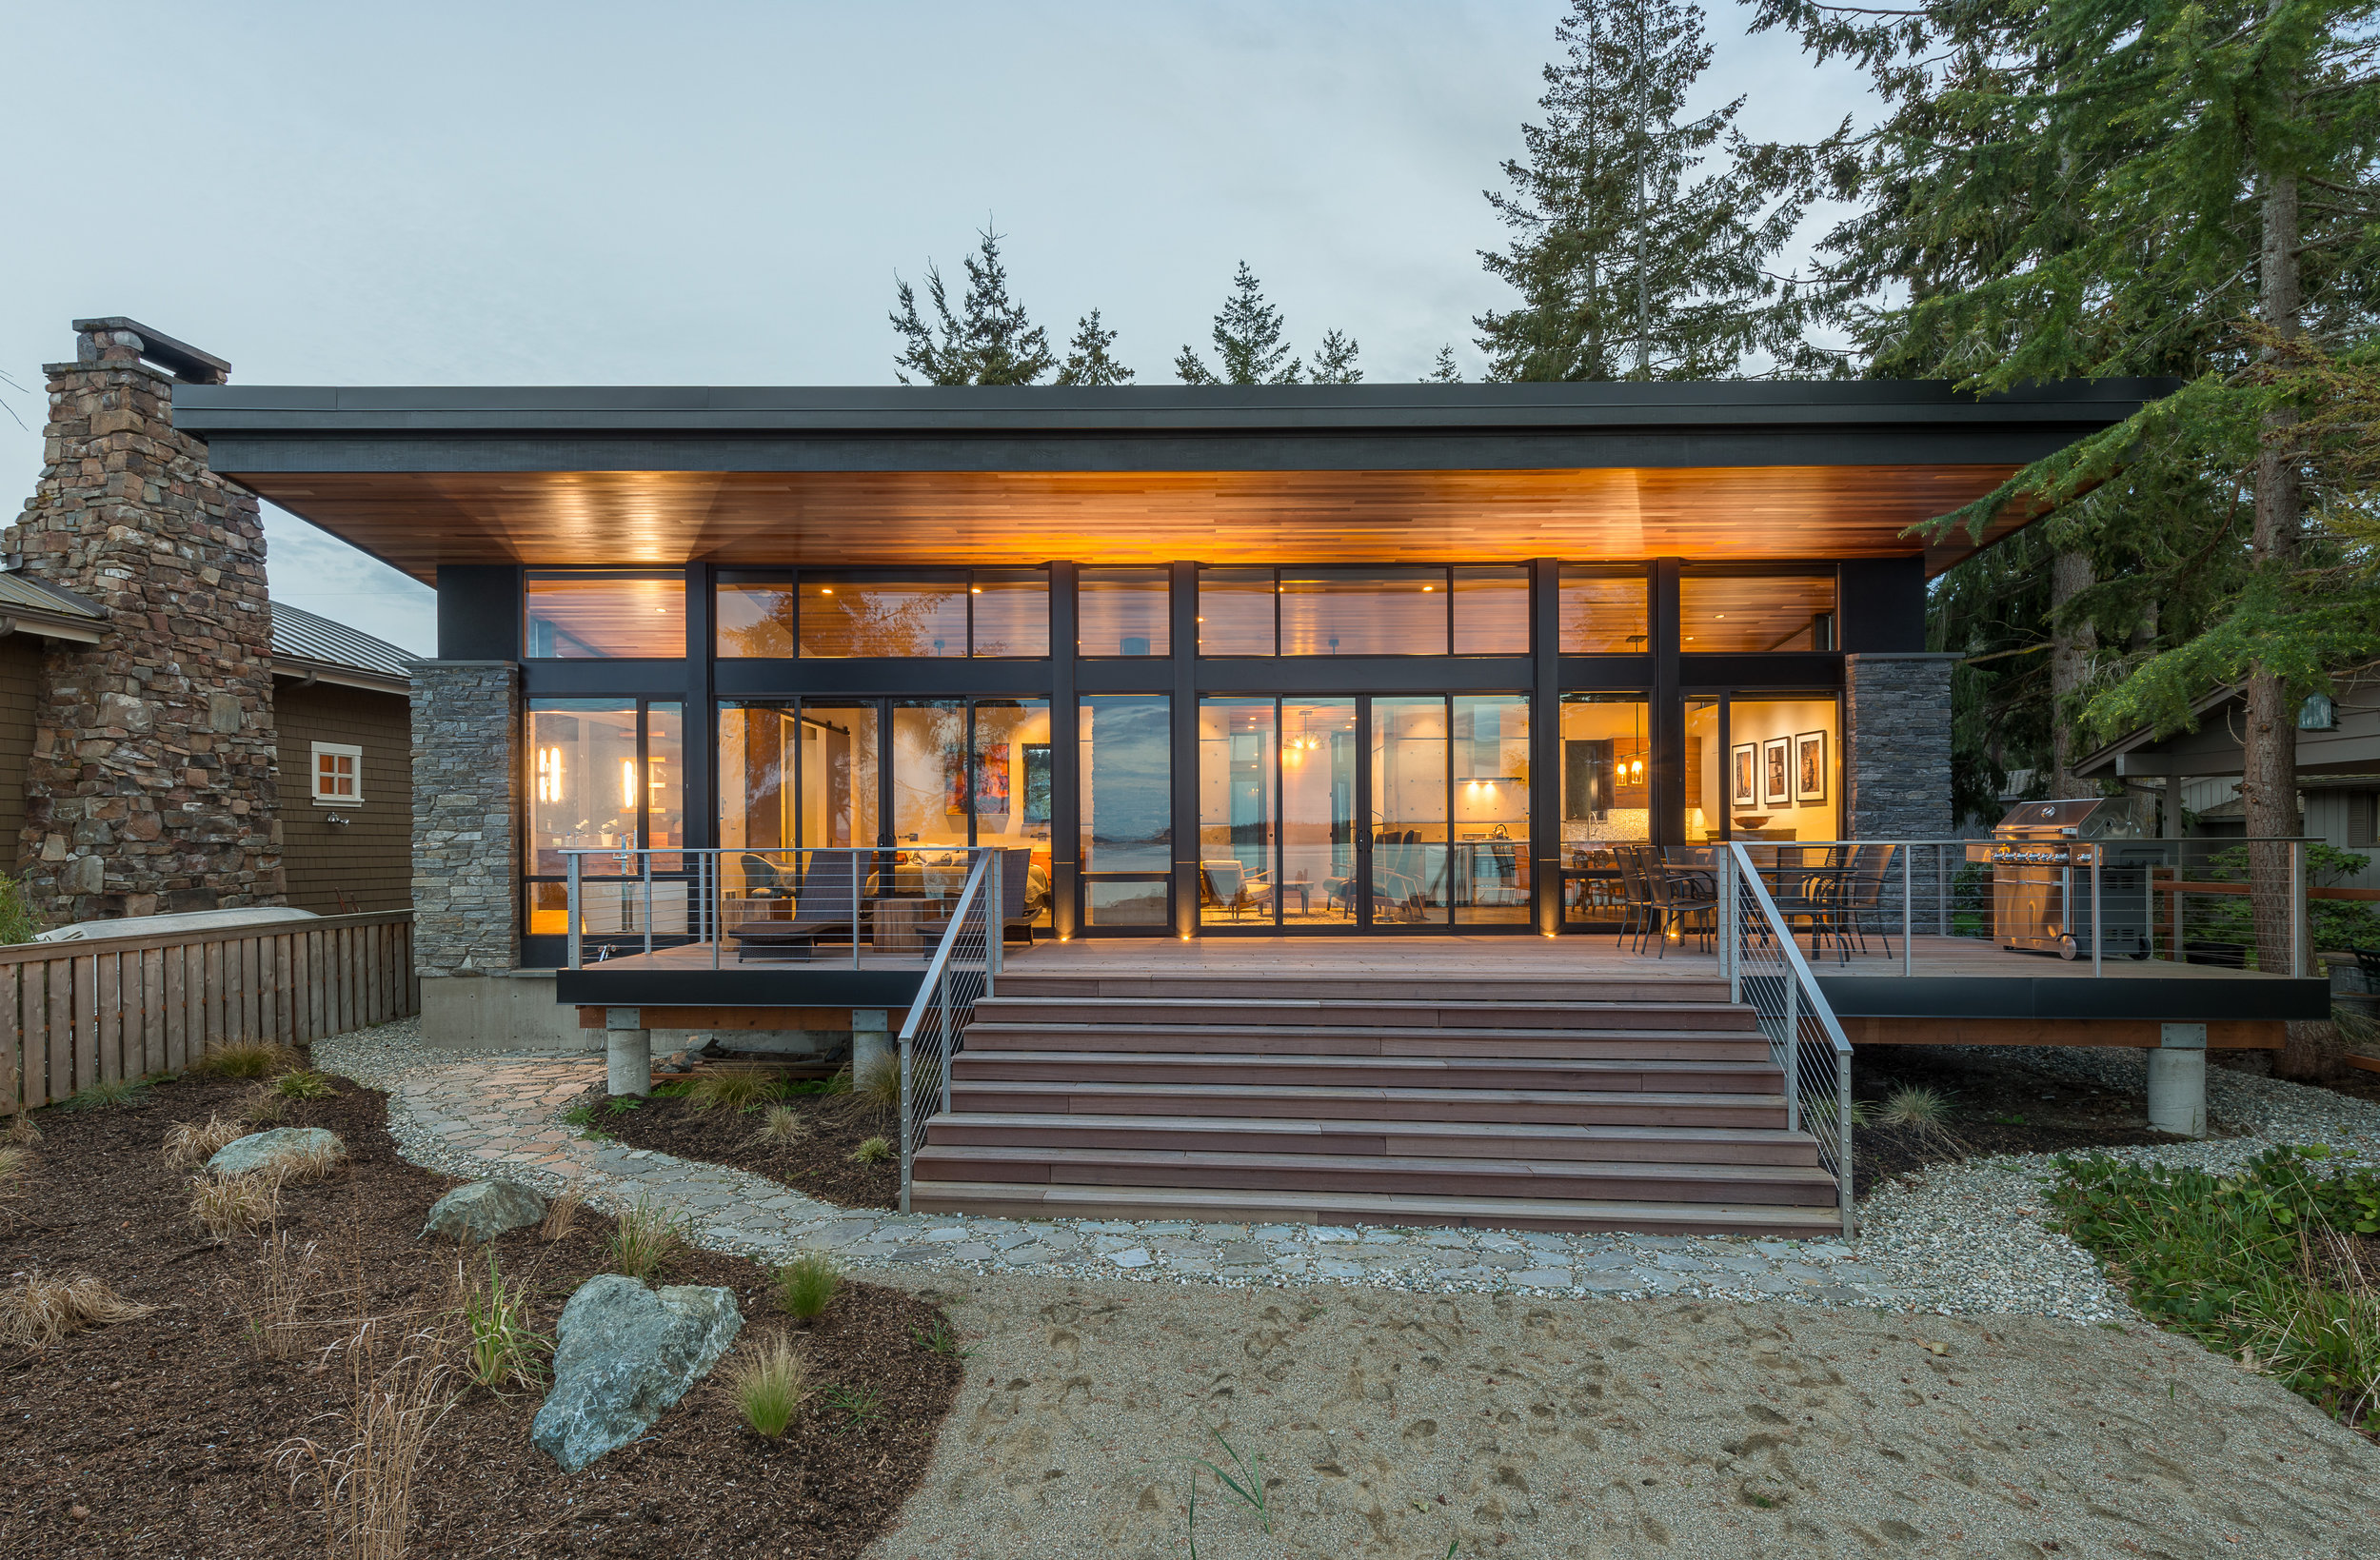 04 - Camano Beach Drive House 5000px - Swift Studio.jpg